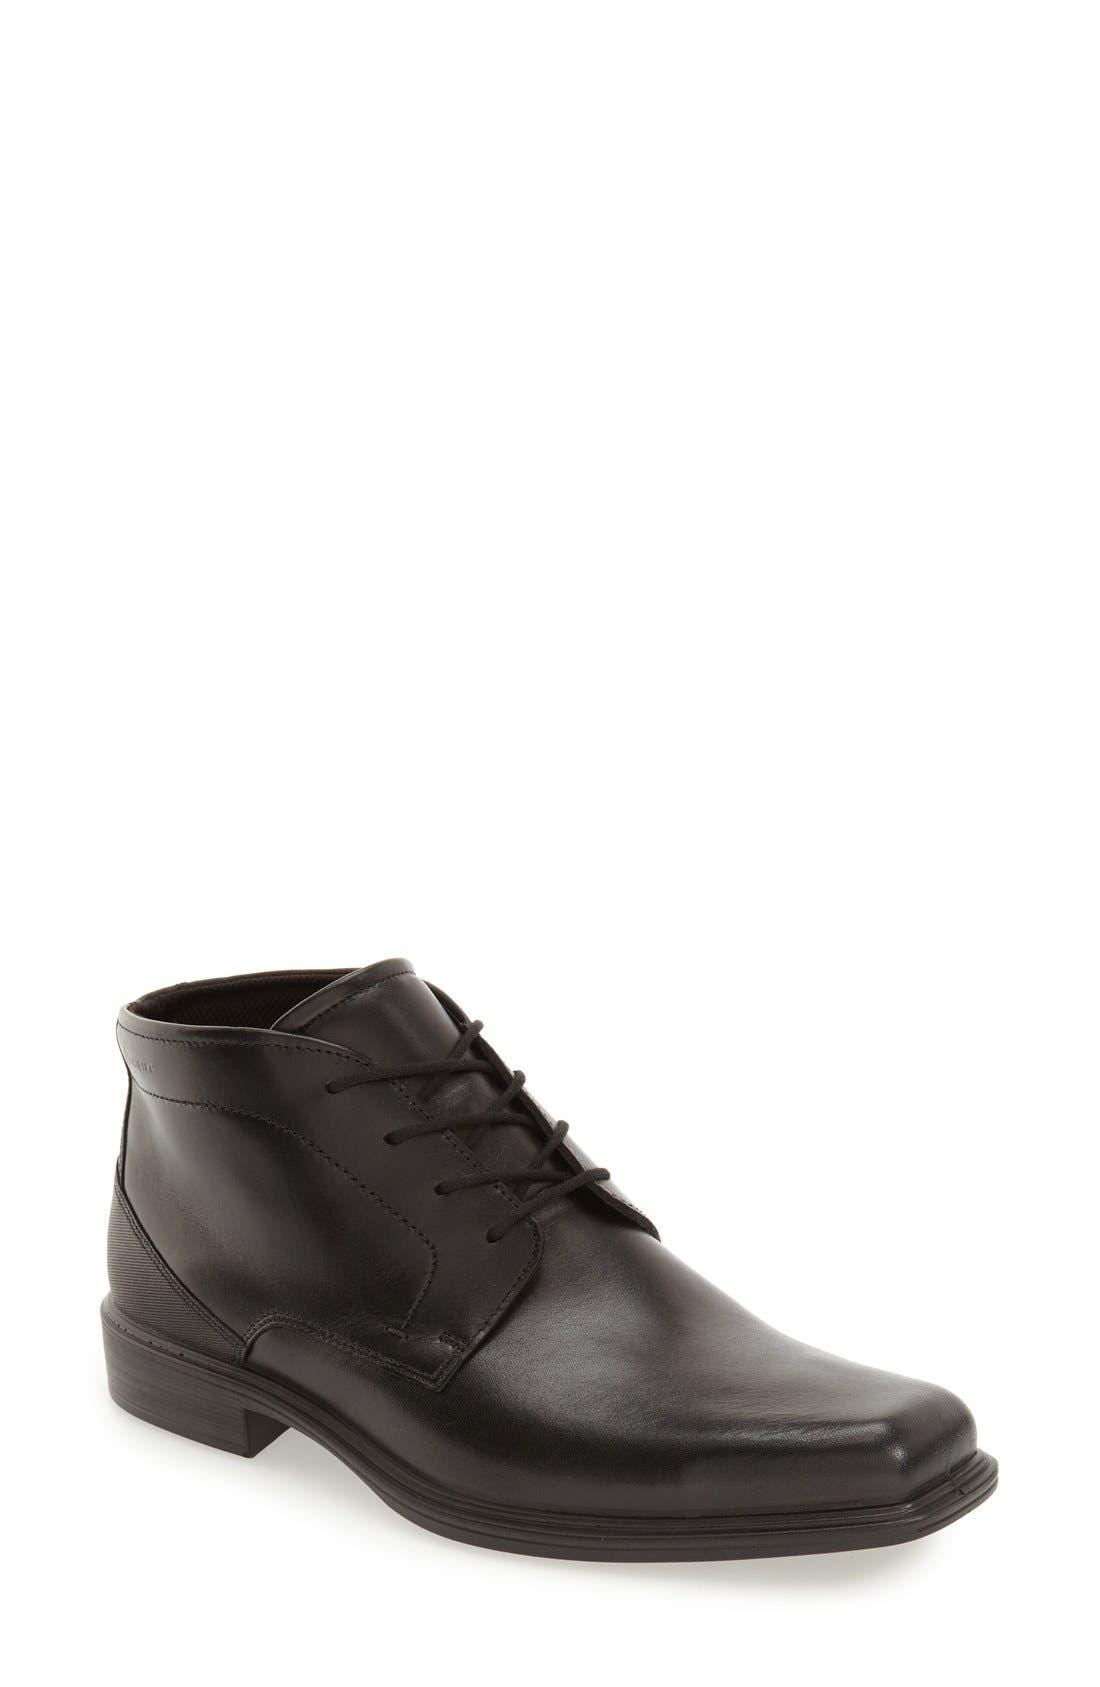 Alternate Image 1 Selected - ECCO 'Johannesburg GTX' Chukka Boot (Men)